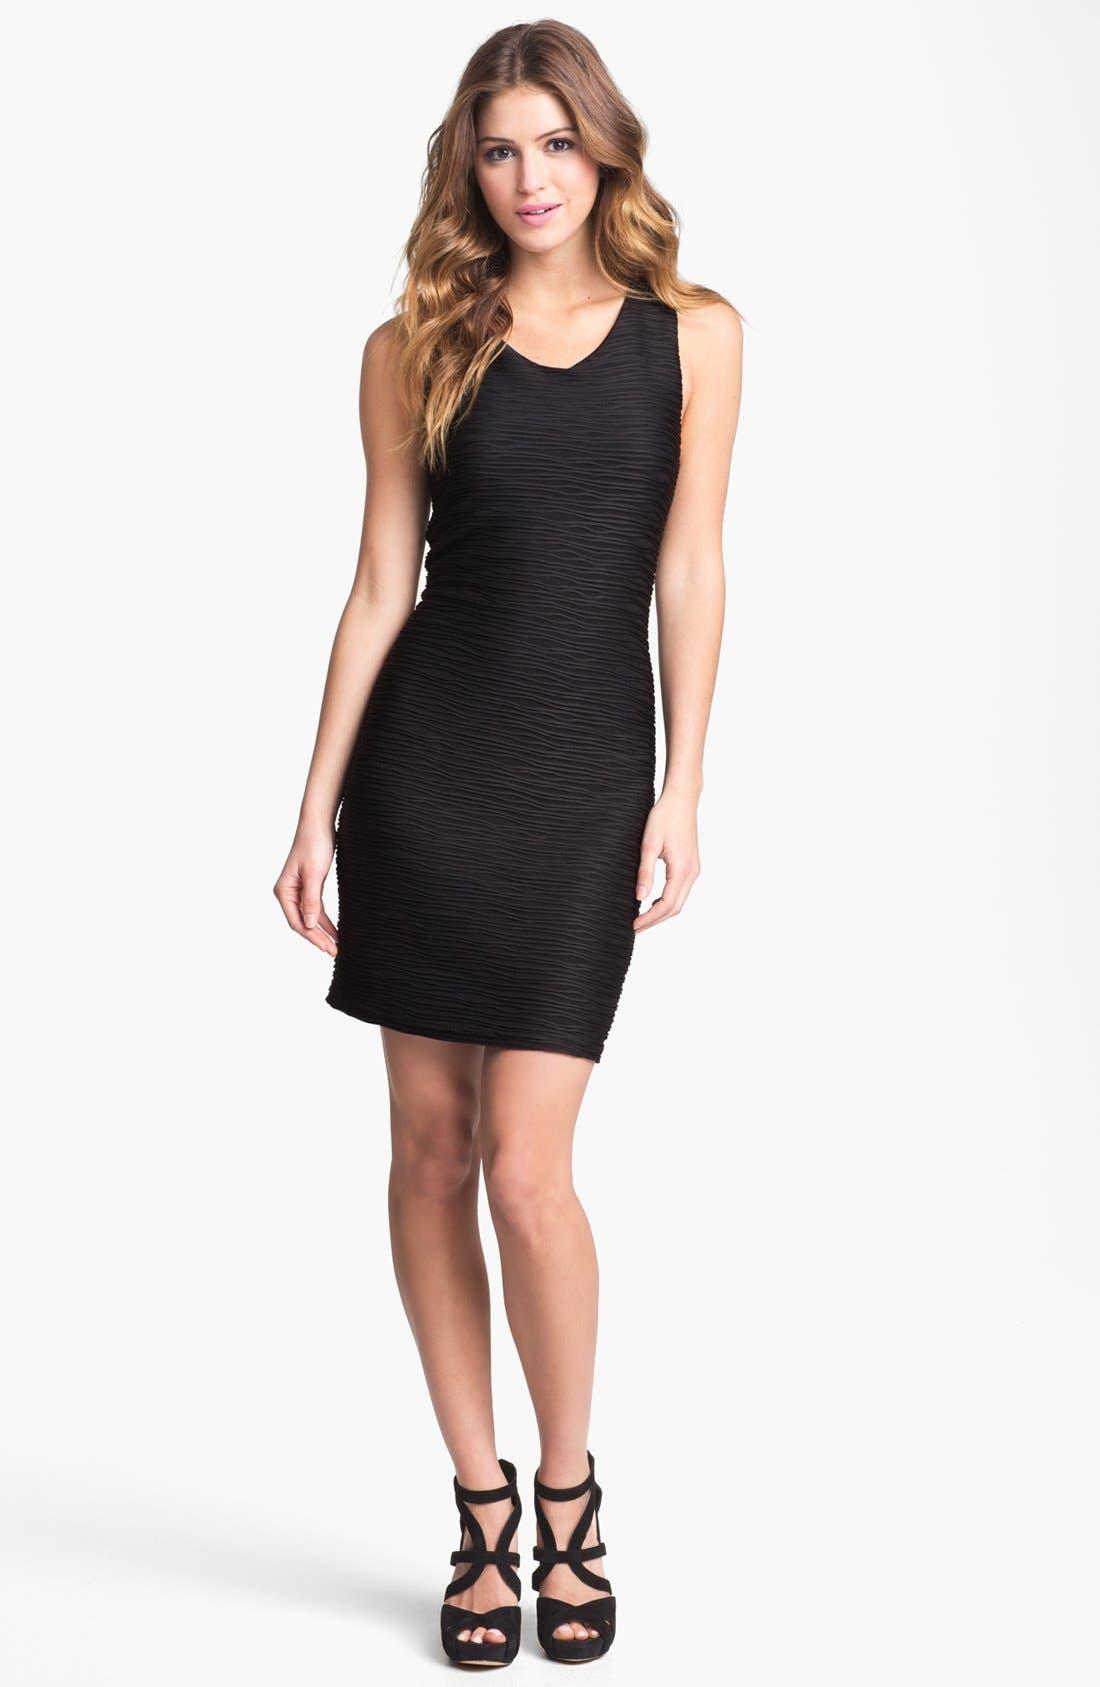 Alternate Image 1 Selected - Abi Ferrin 'Lindsey' Textured Racerback Dress